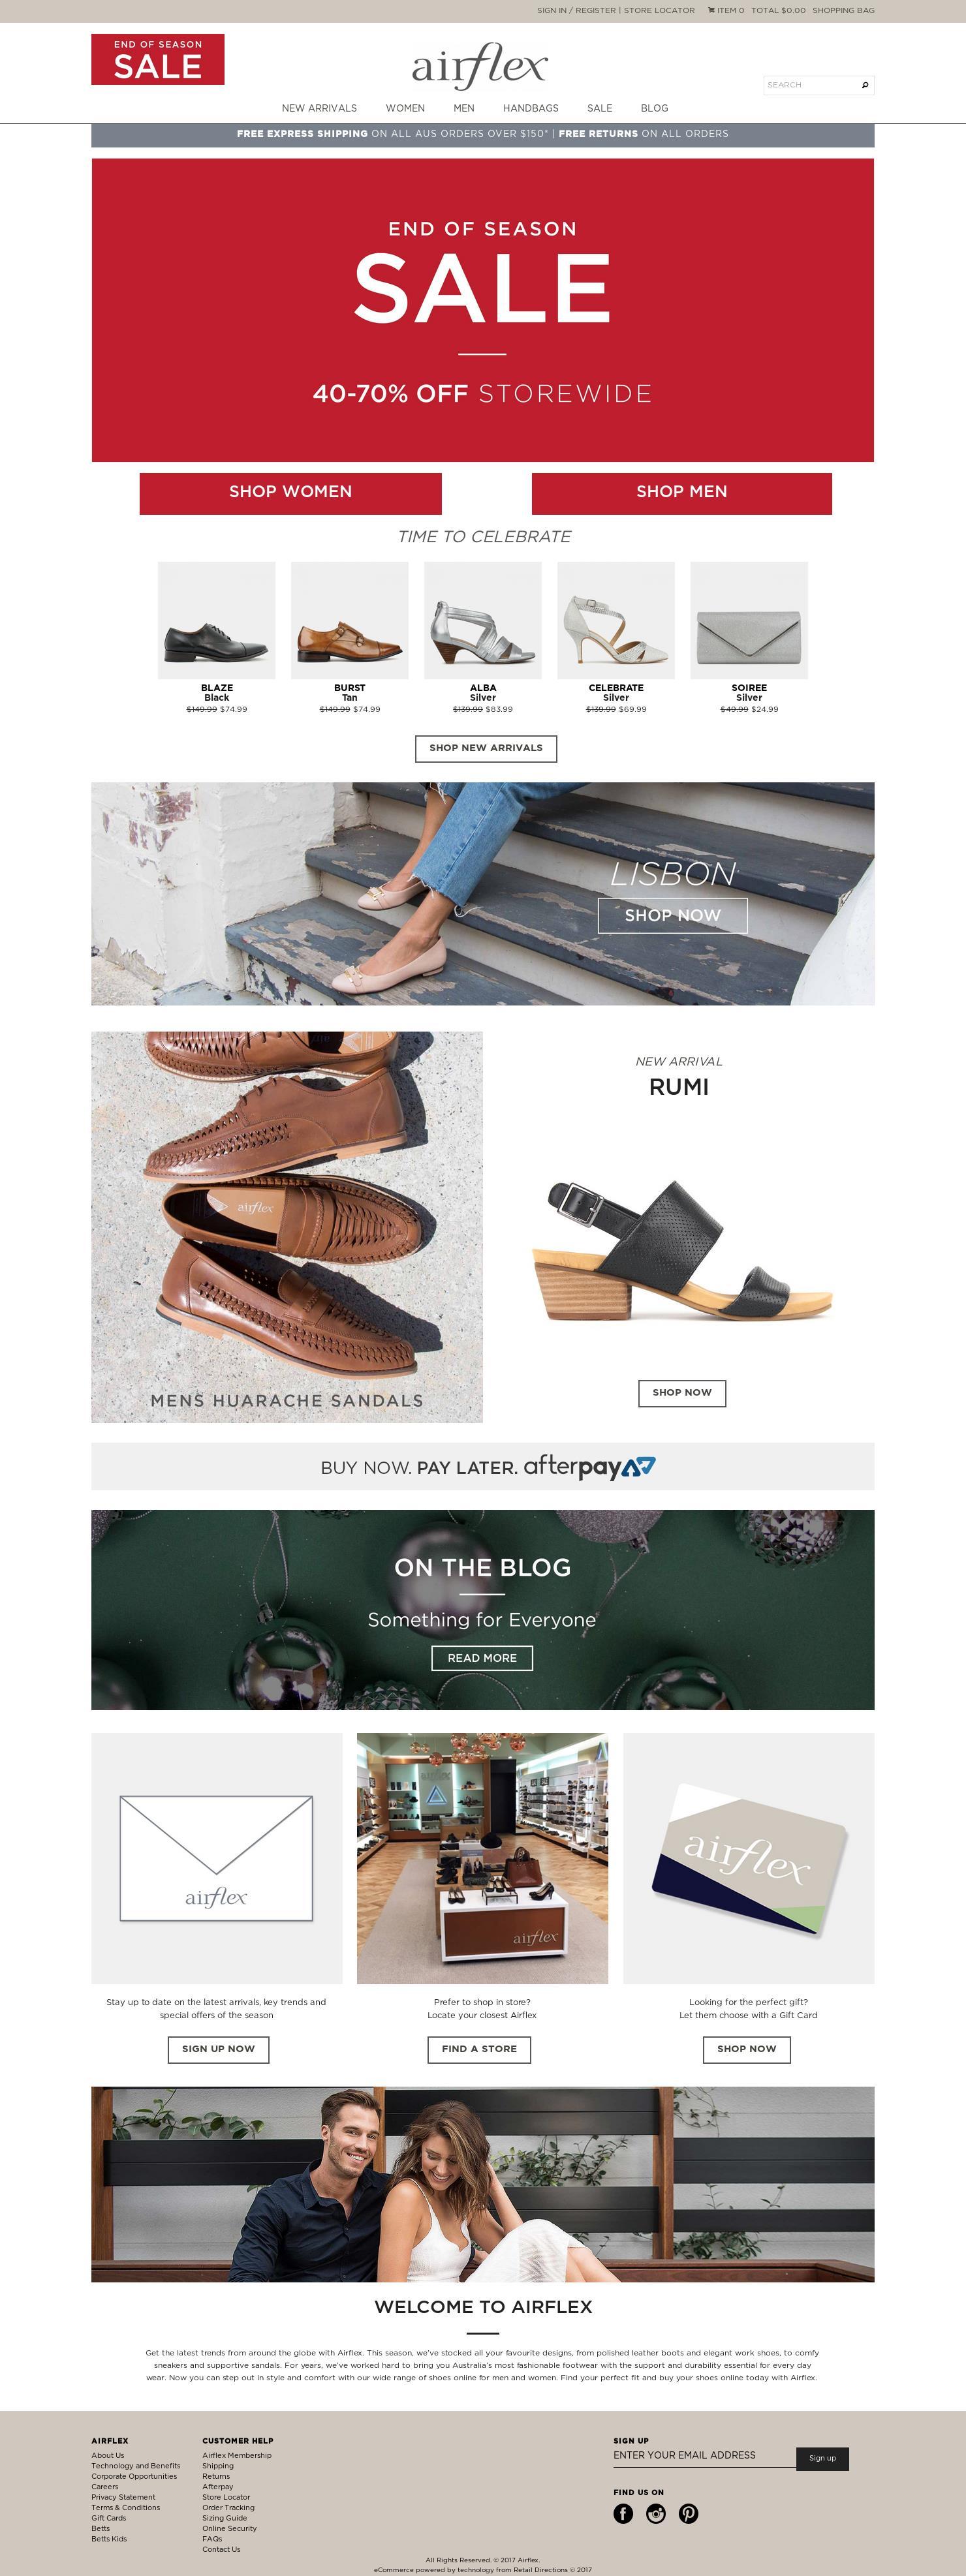 AIRFLEX JOONDALUP WA - Merchant details